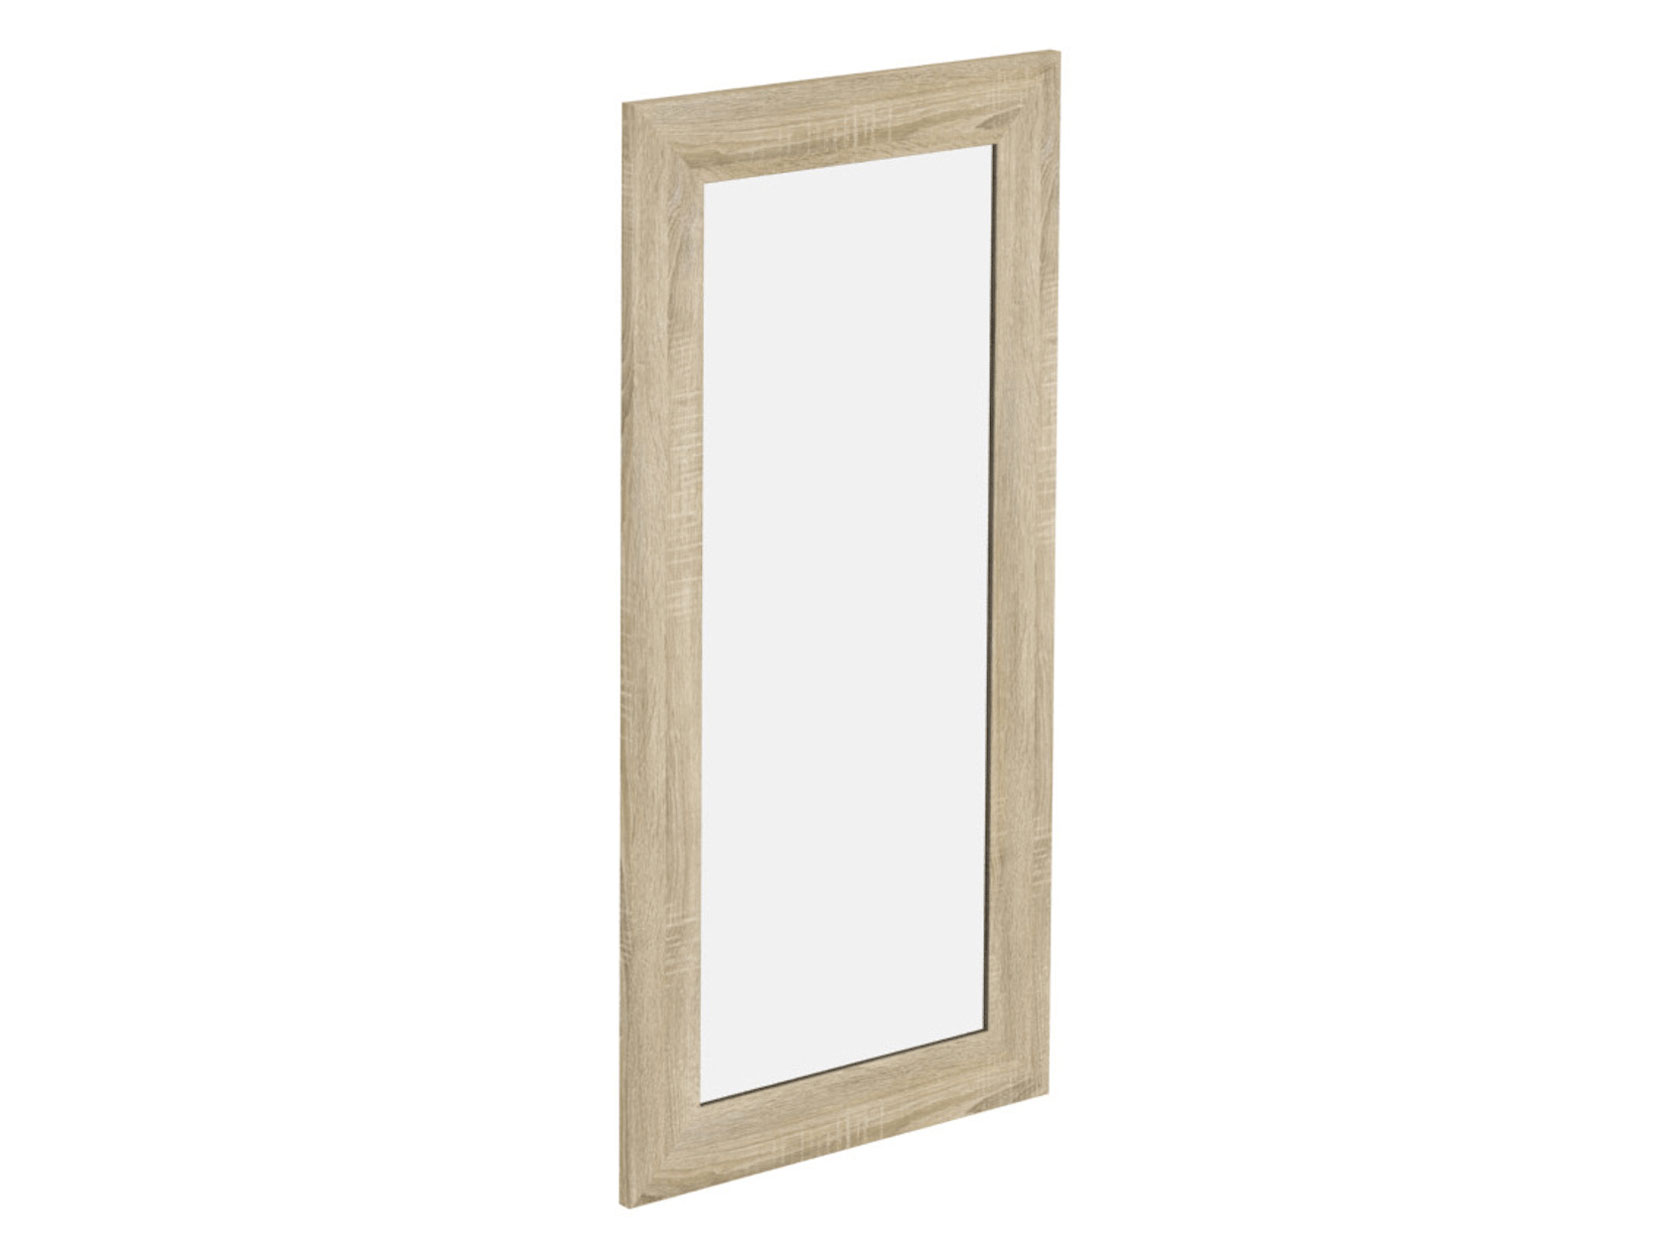 Настенное зеркало Леонардо